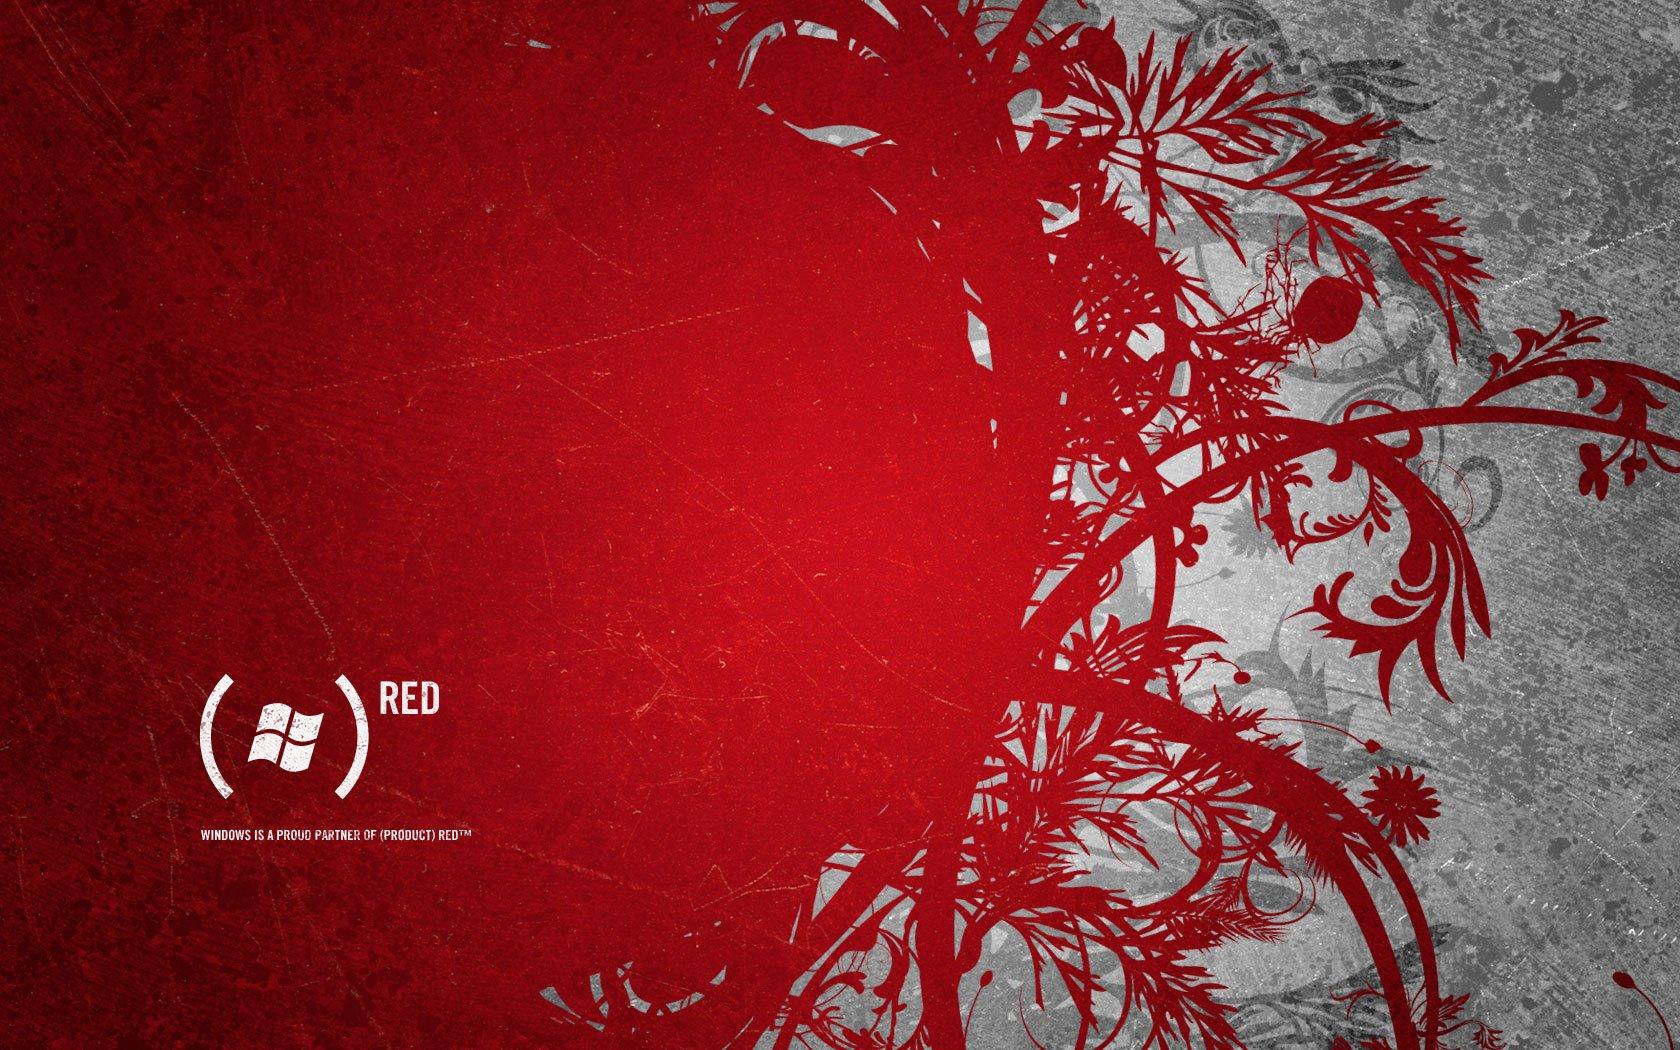 1680x1050 Dell Red Bloom desktop PC and Mac wallpaper 1680x1050